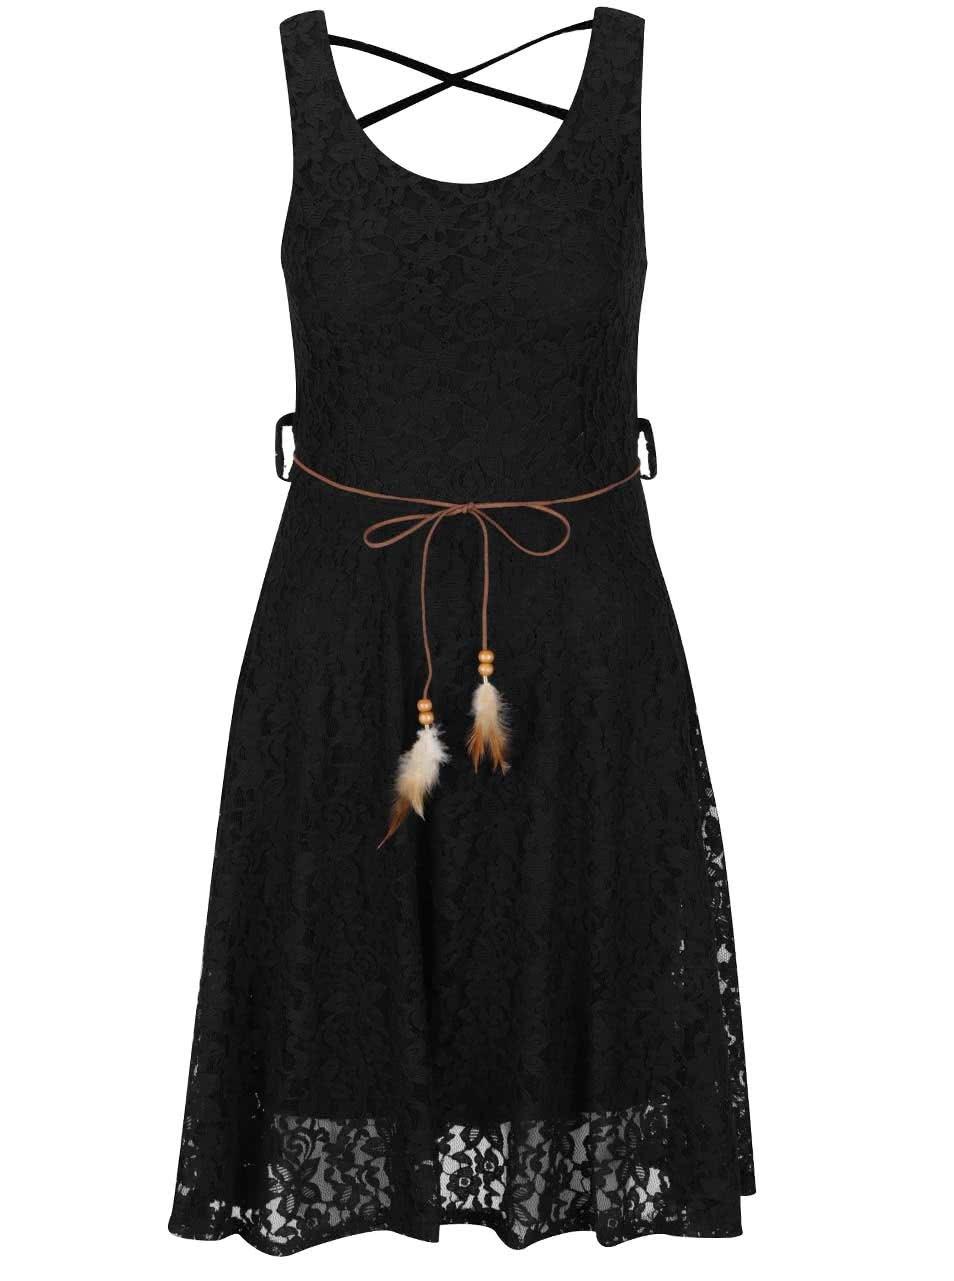 Černé krajkové šaty s páskem Haily's Macy